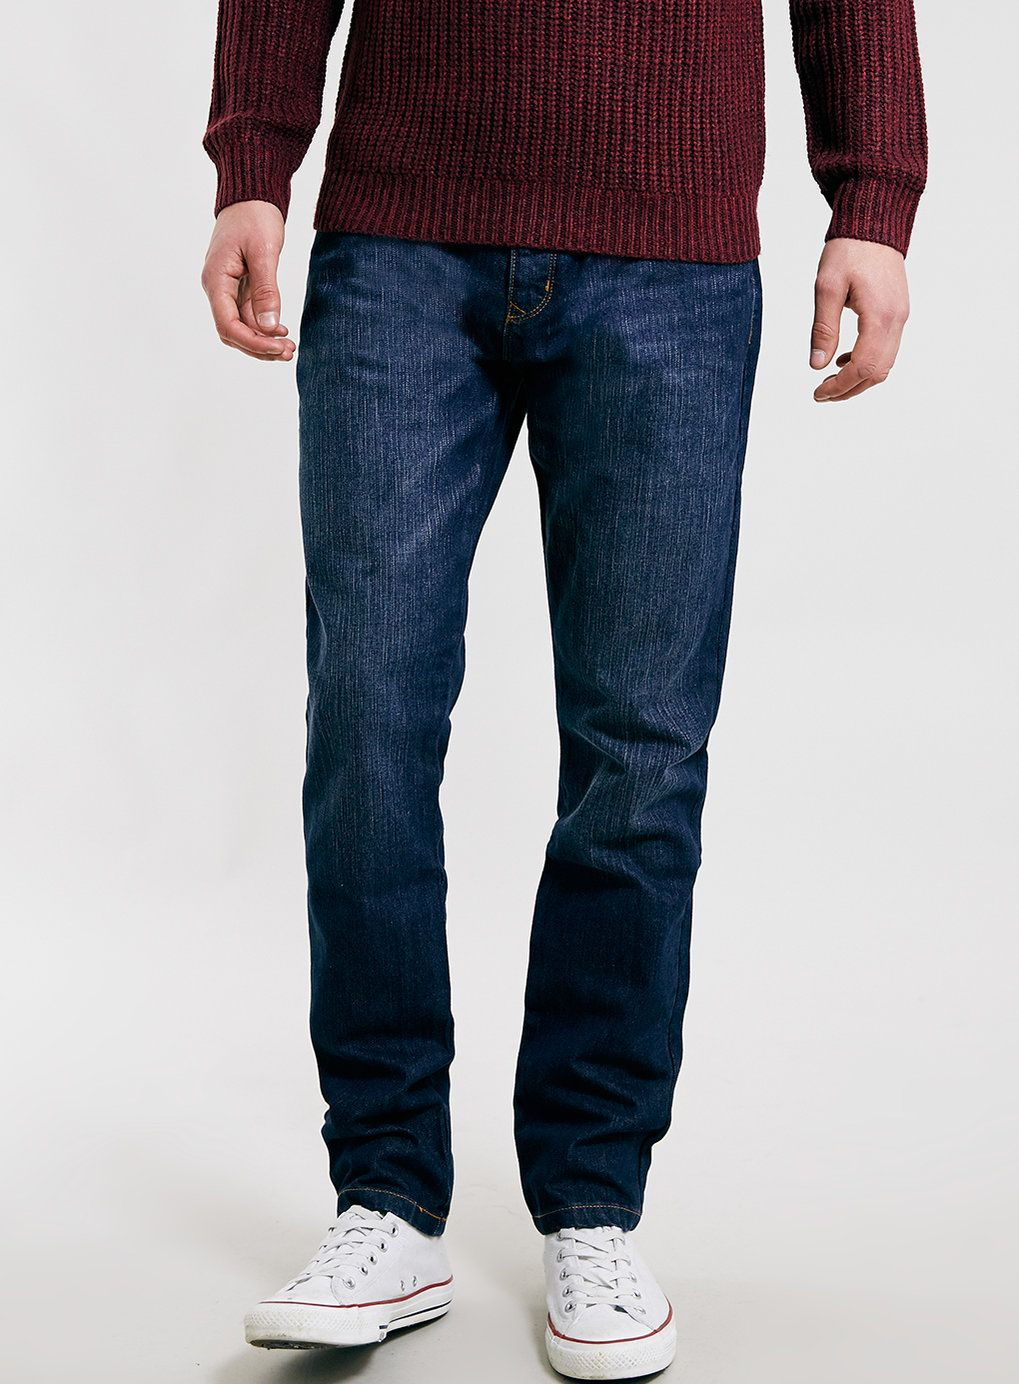 Topman straight leg jeans £55